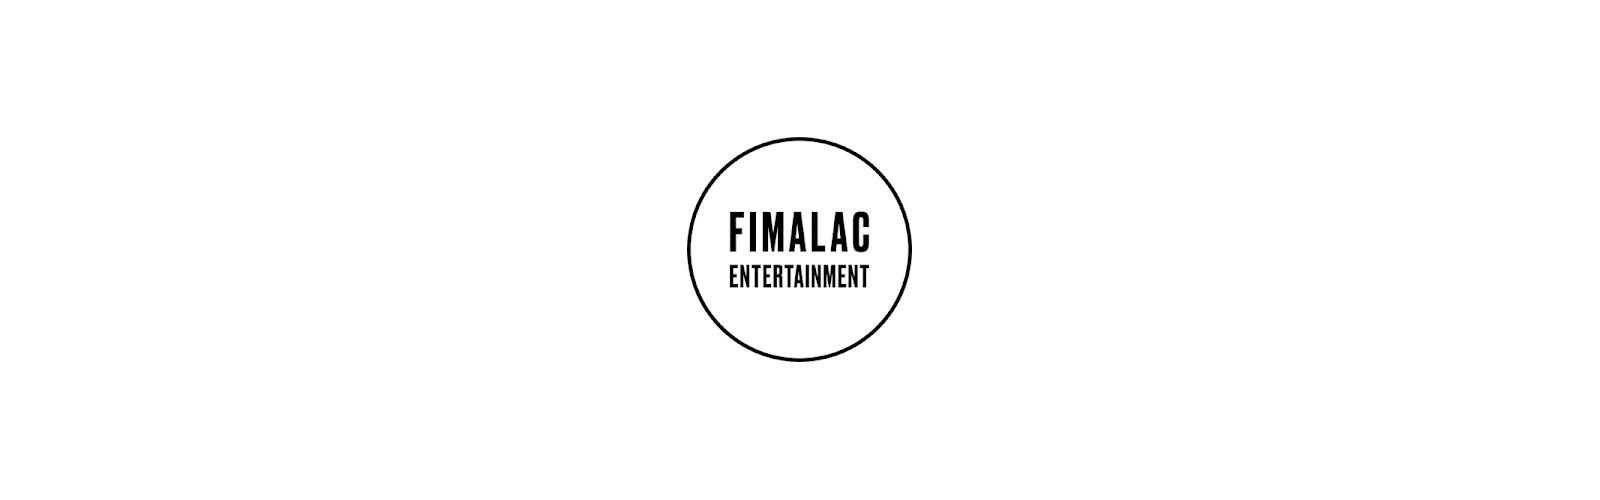 Fimalac-Entertainment